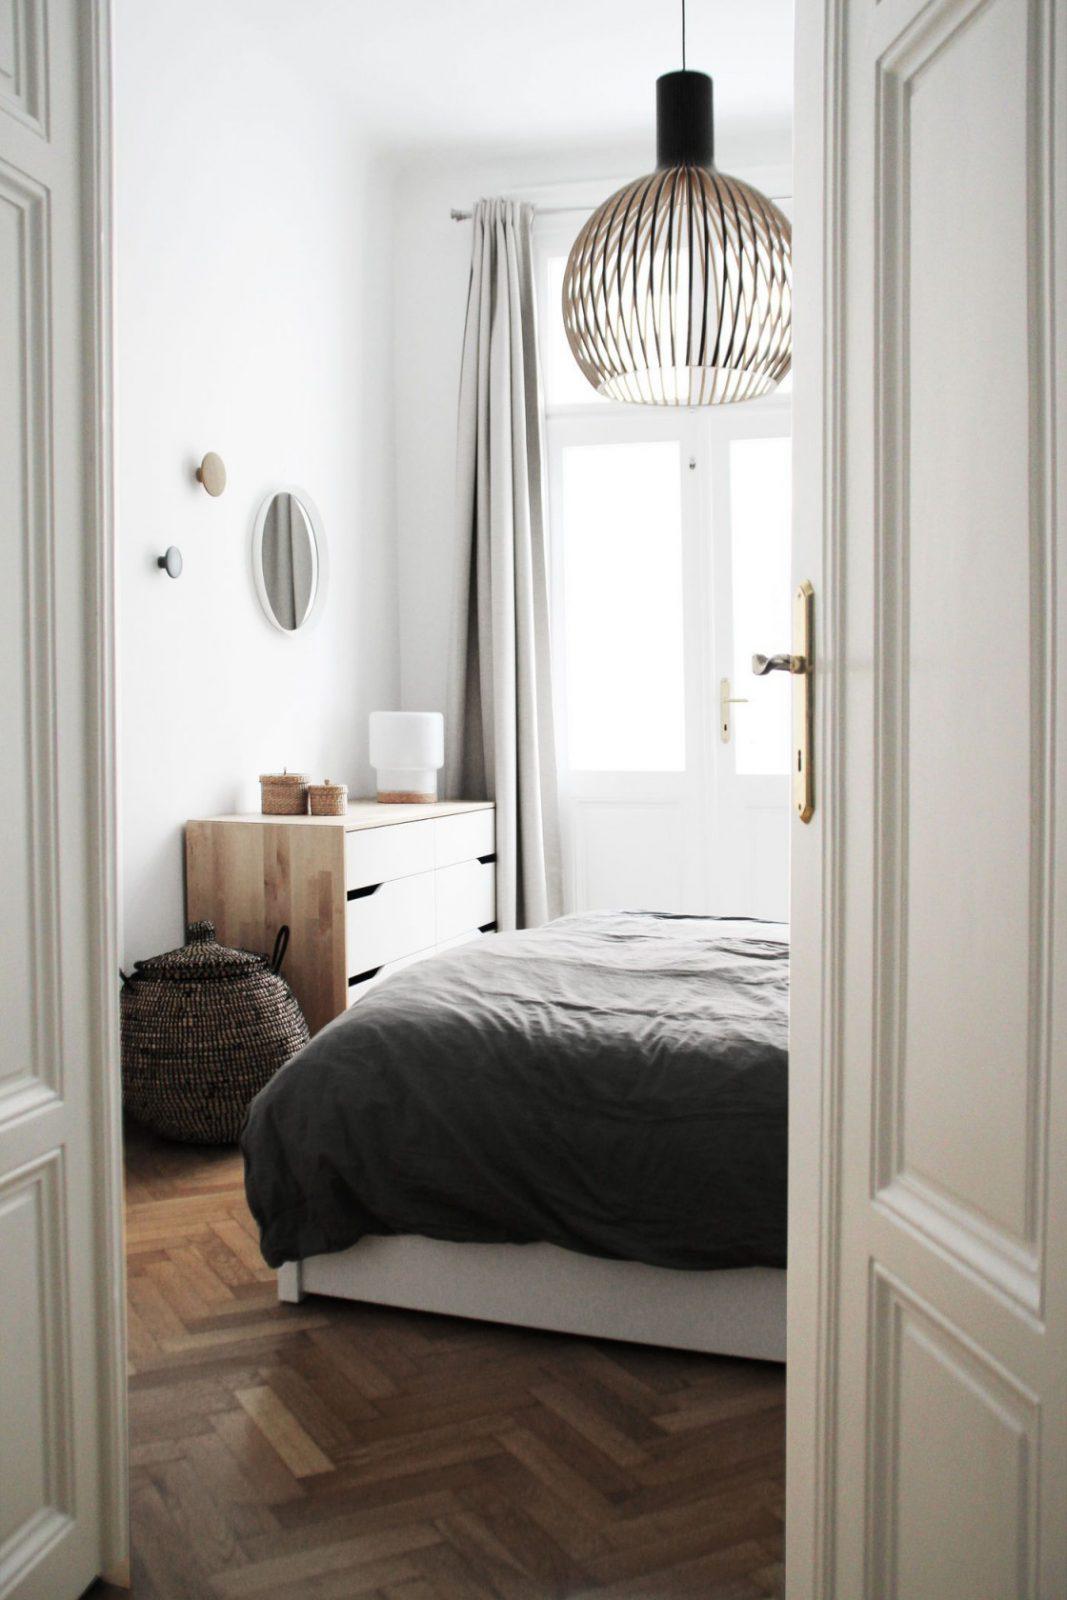 Gardinen Schlafzimmer Ideen  Bedroom Ideas  Bedroom Ideas von Ideen Gardinen Schlafzimmer Photo